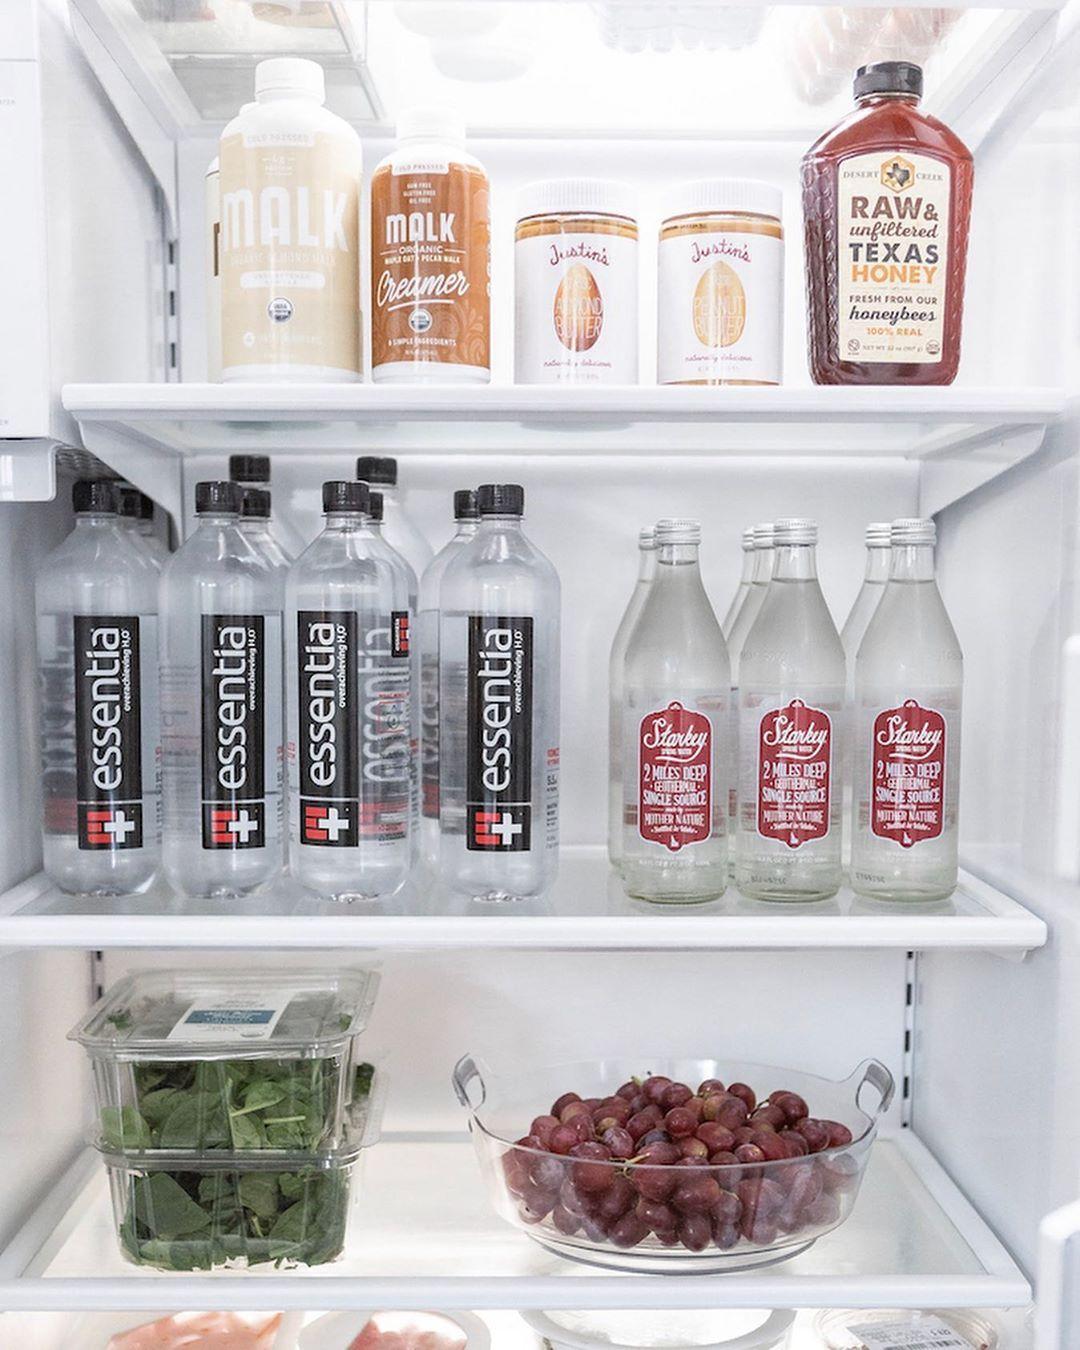 We 👀 spy, our Unsweetened Almond 🥛, Unsweetened Oat Milk 🌾+ Maple 🍁 Oat Creamer inside @krystalschlegel fridge.  Anyone else having fridge envy? Slide through to see how Krystal organized her fridge + showed us MAJOR MALK 💙. .⠀ .⠀ .⠀  ⠀